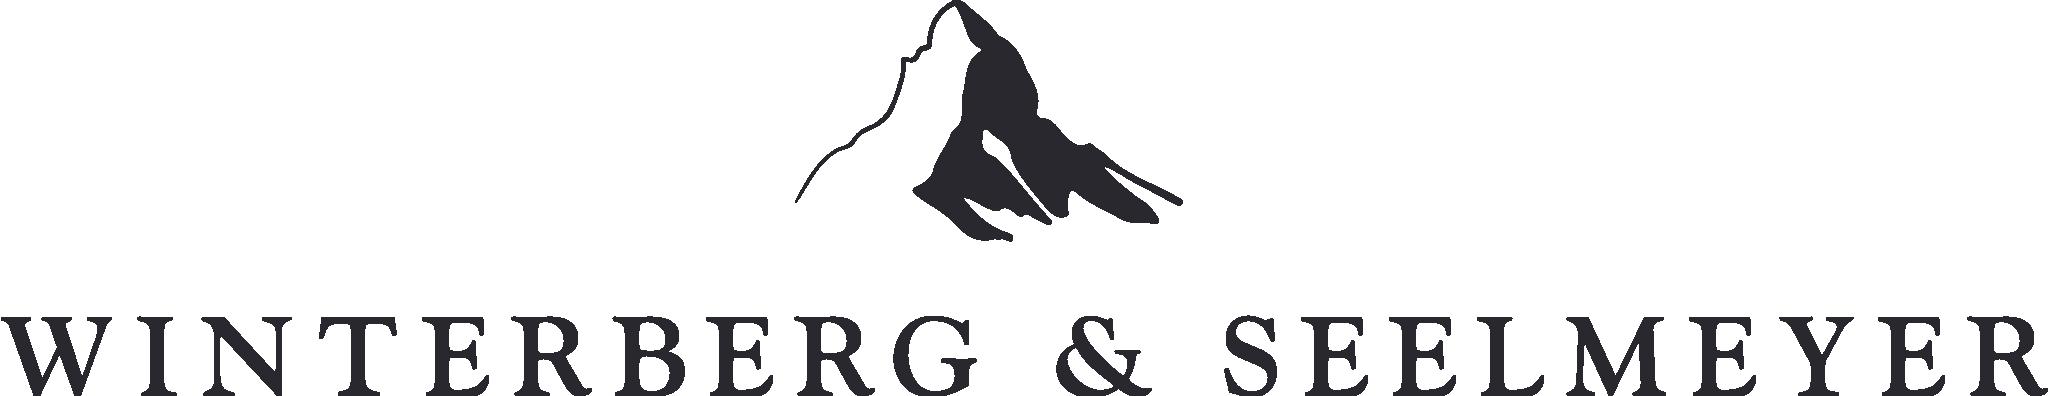 Winterberg & Seelmeyer